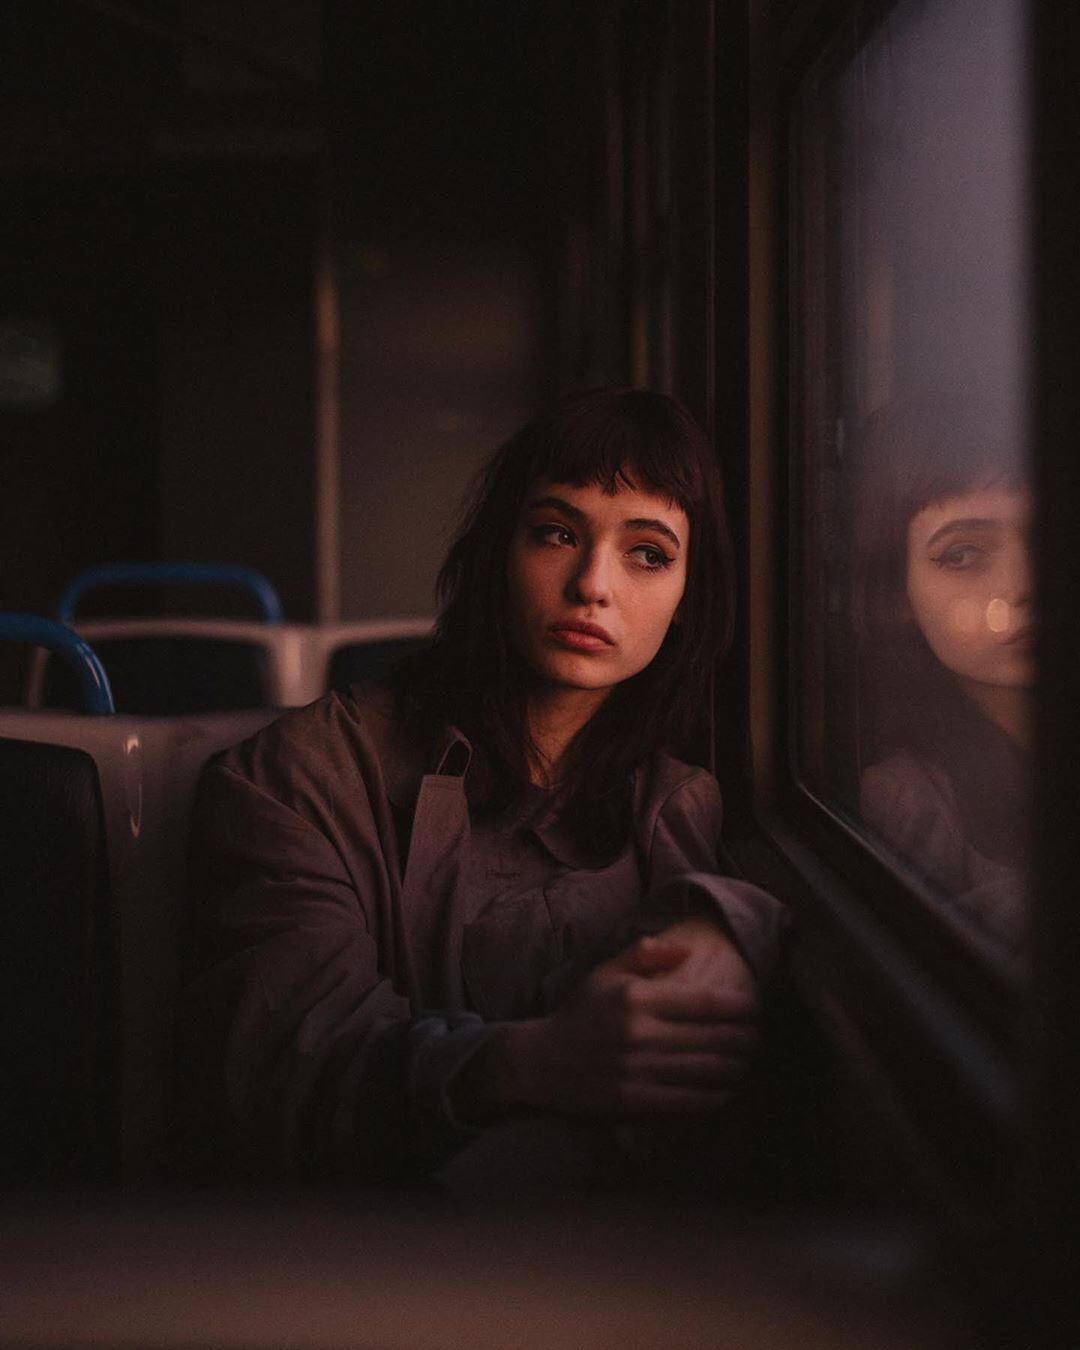 Caterina Edison by Andrew Skorohod